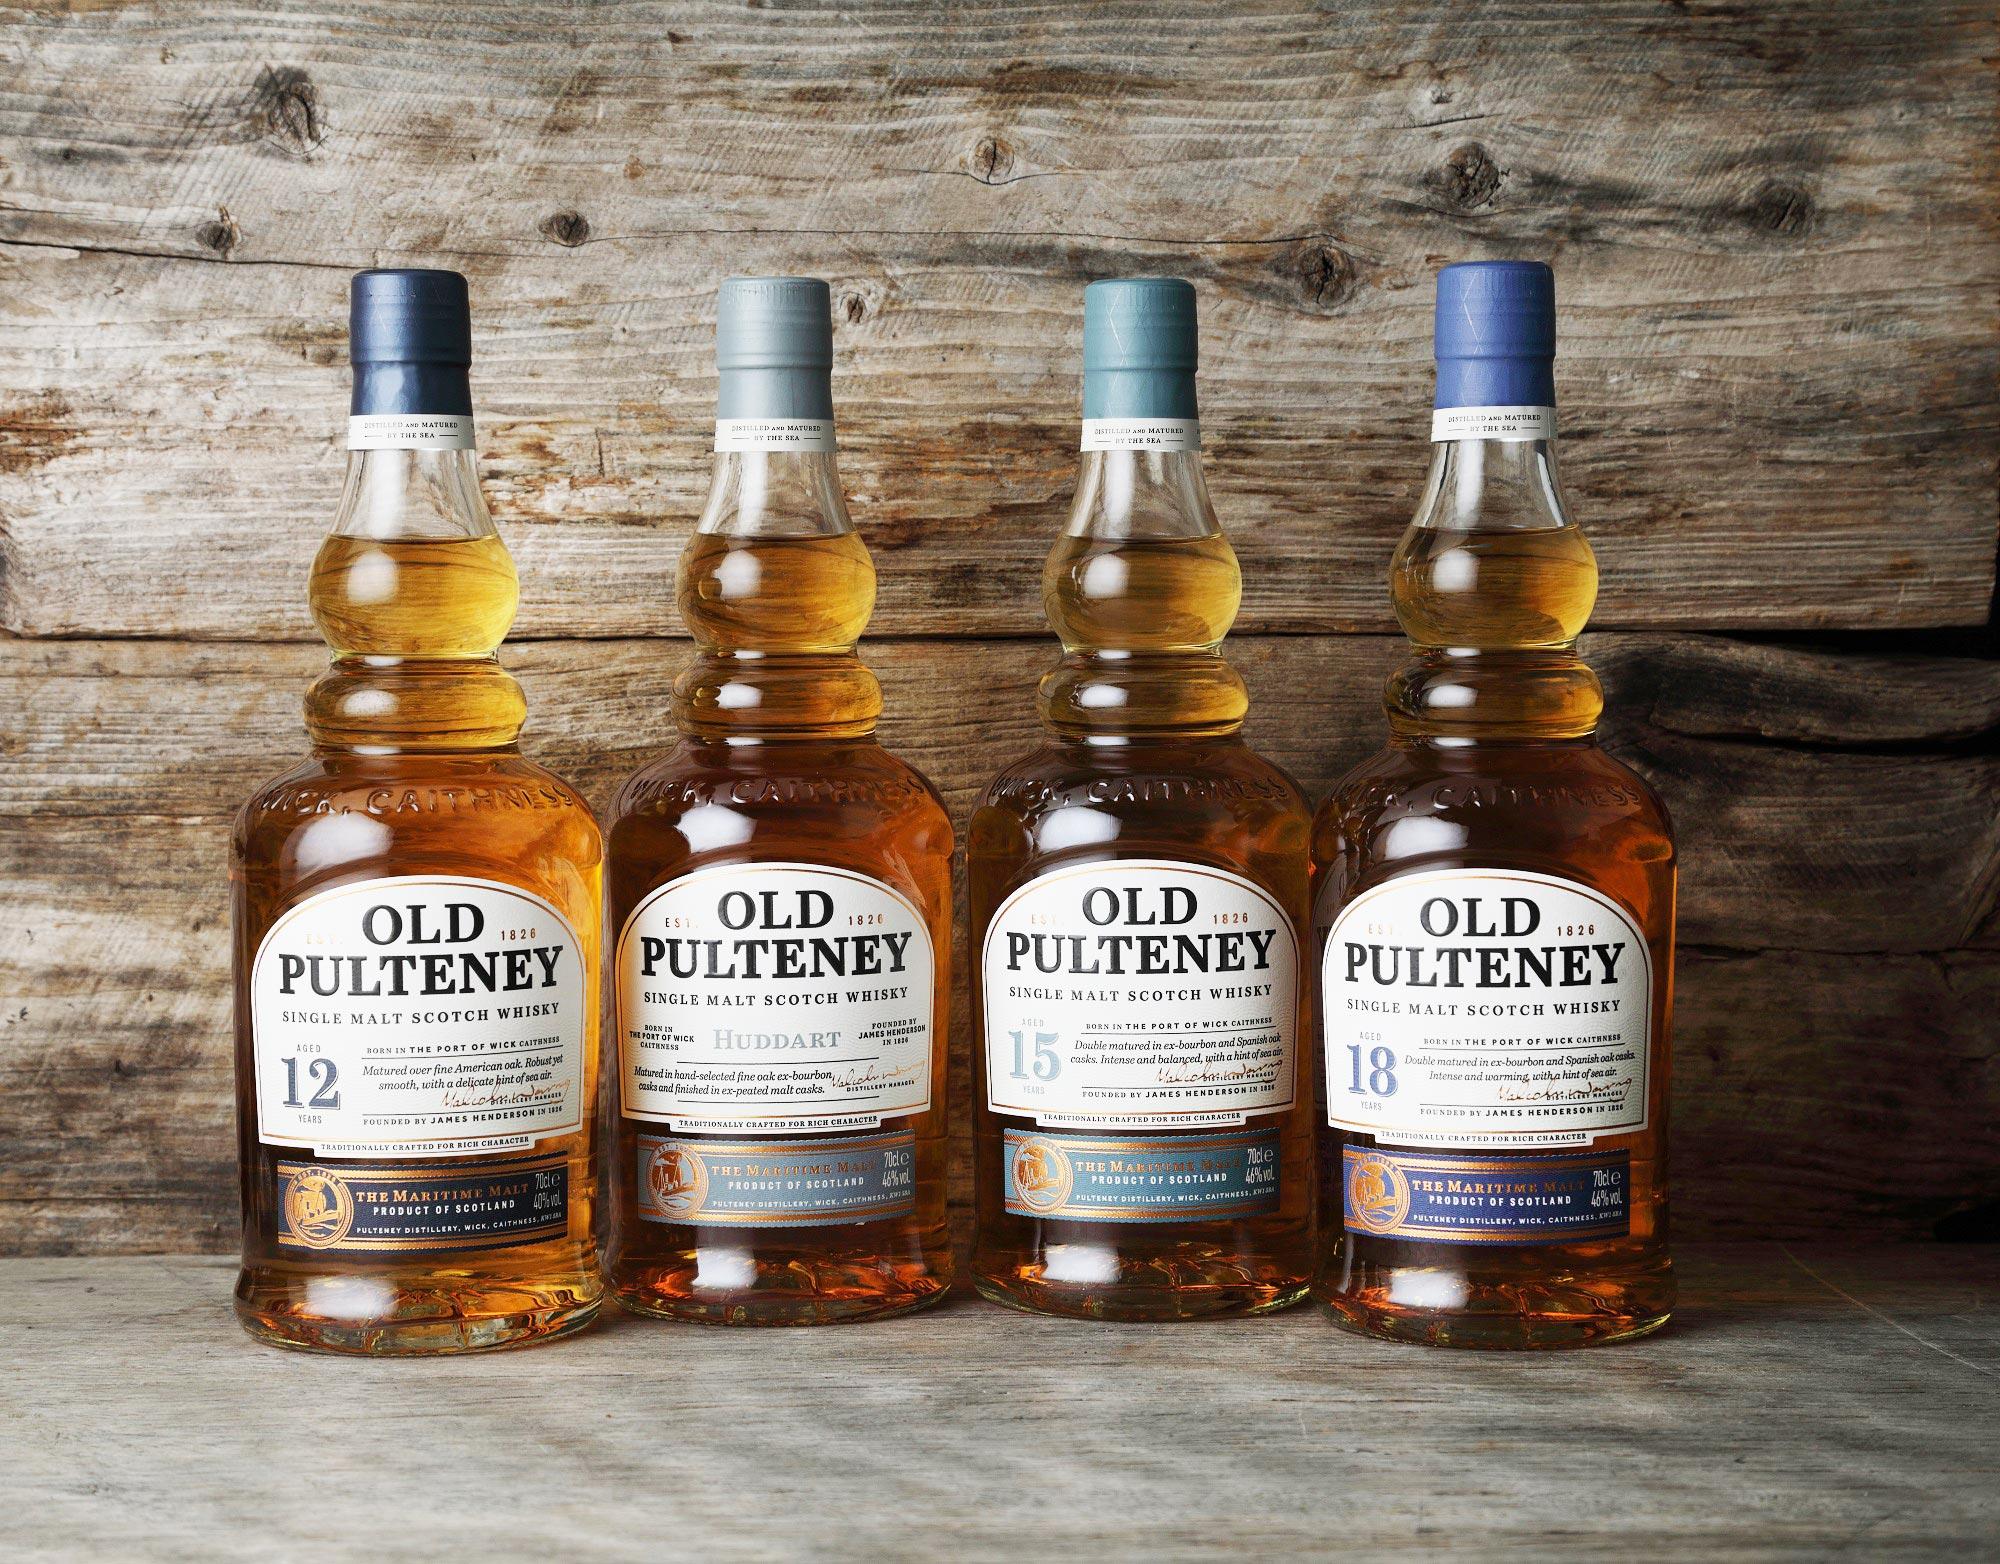 Old Pulteney's Maritime Malt Whiskies